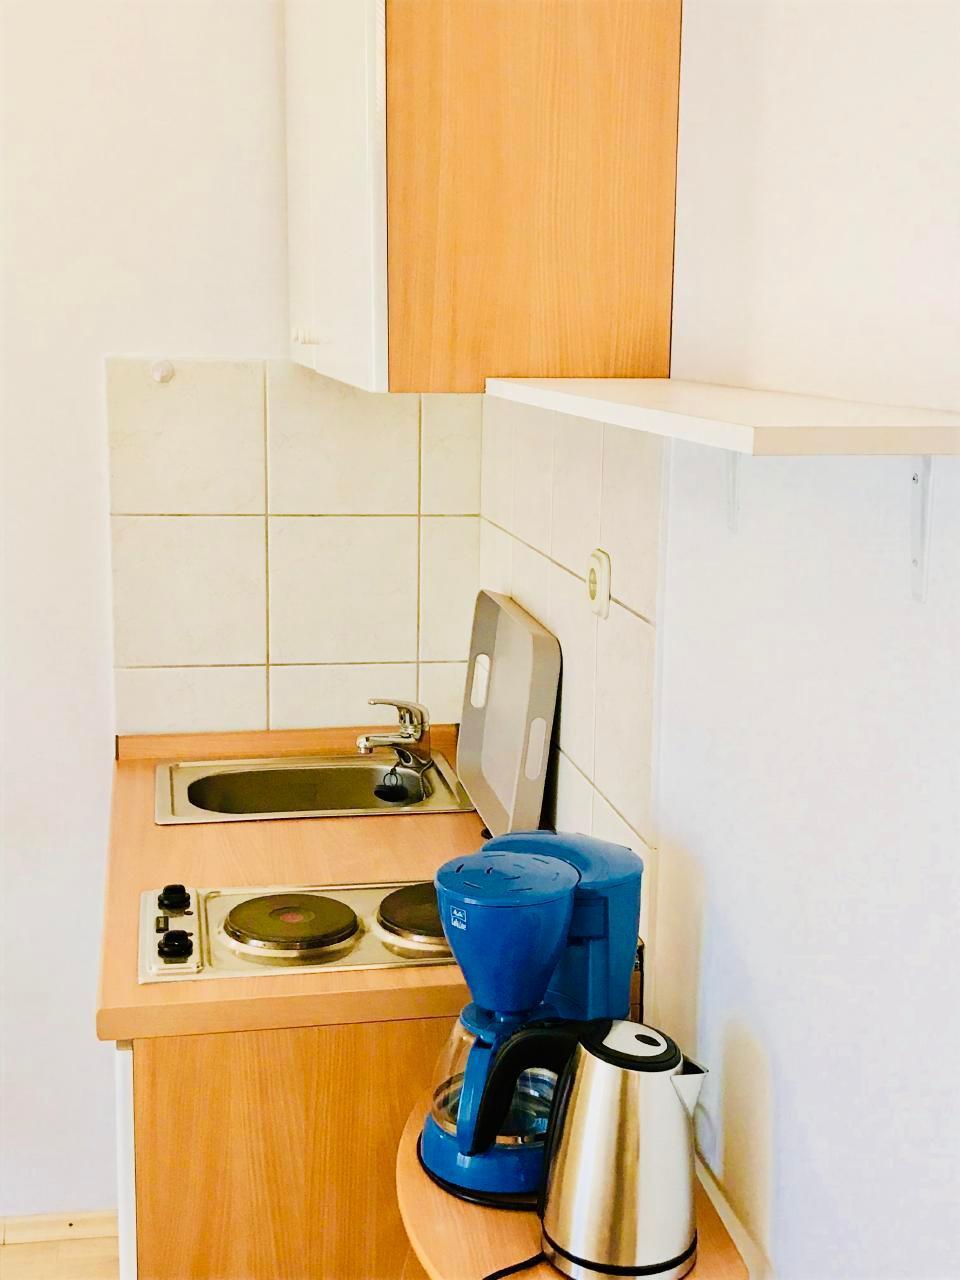 Ferienwohnung Apartmenthaus Ruza 4 - Studio (98392), Kaštel Štafilić, , Dalmatien, Kroatien, Bild 11